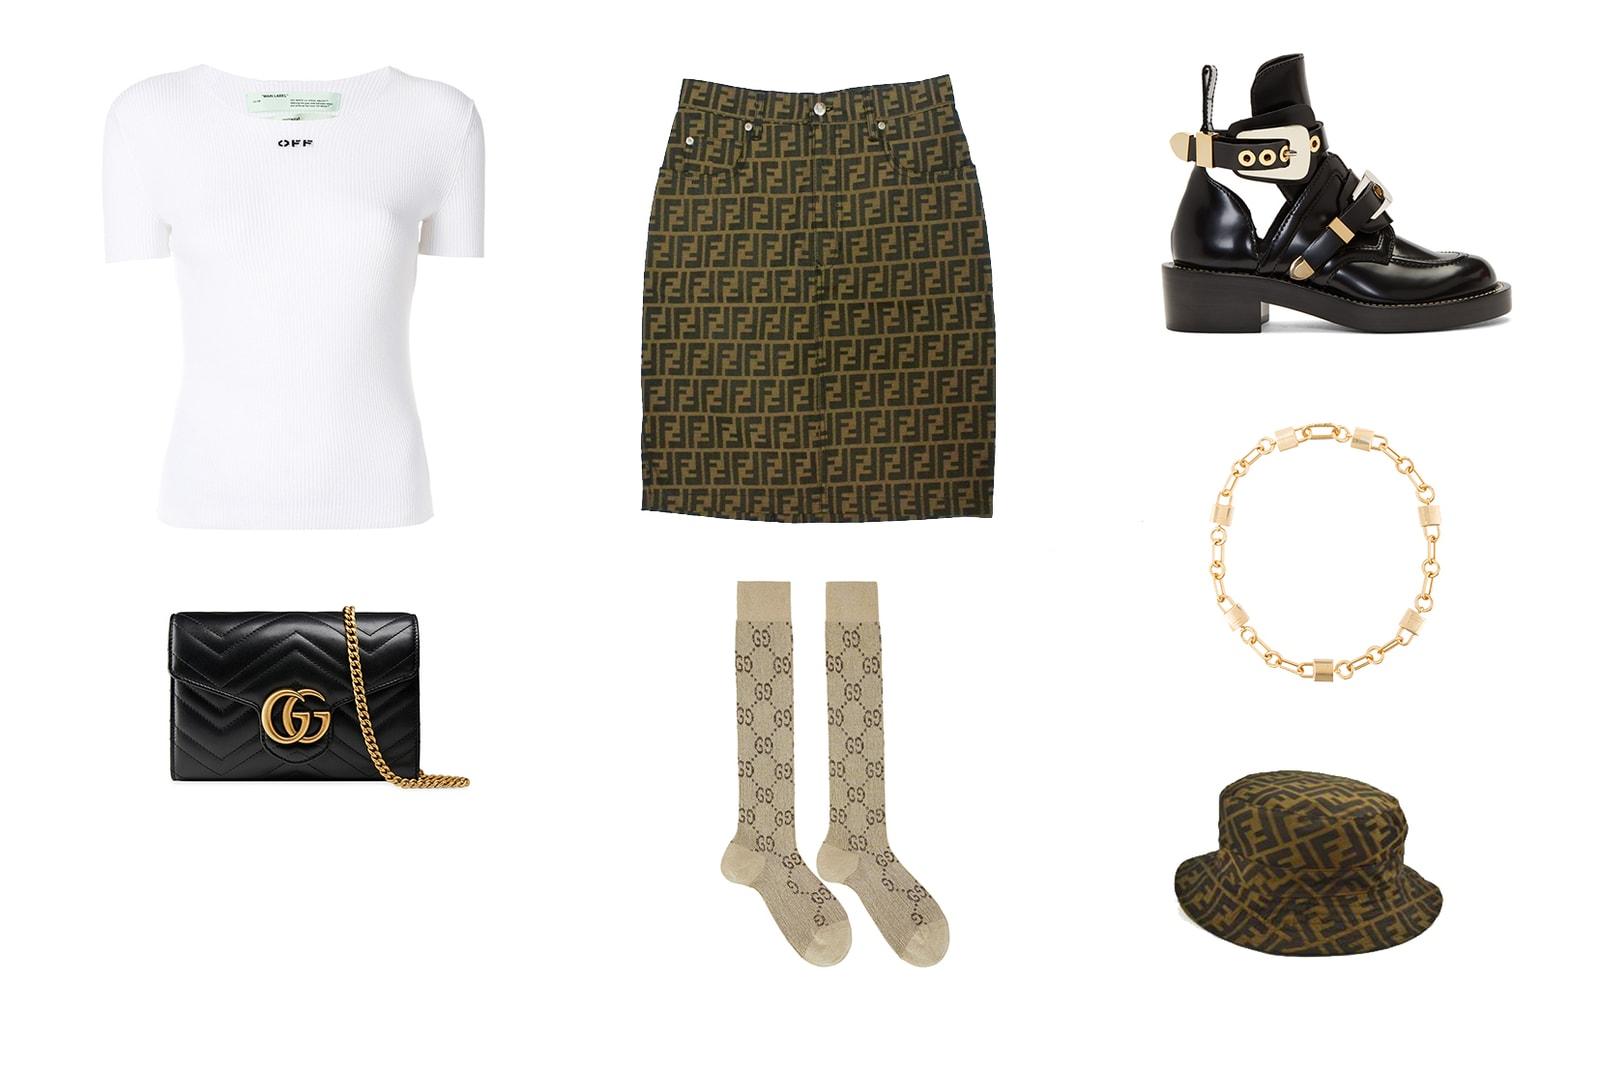 Vintage Fendi, Gucci Monogram Outfit Inspiration Balenciaga Off-White AMBUSH Style Guide Fashion Ideas Summer Look